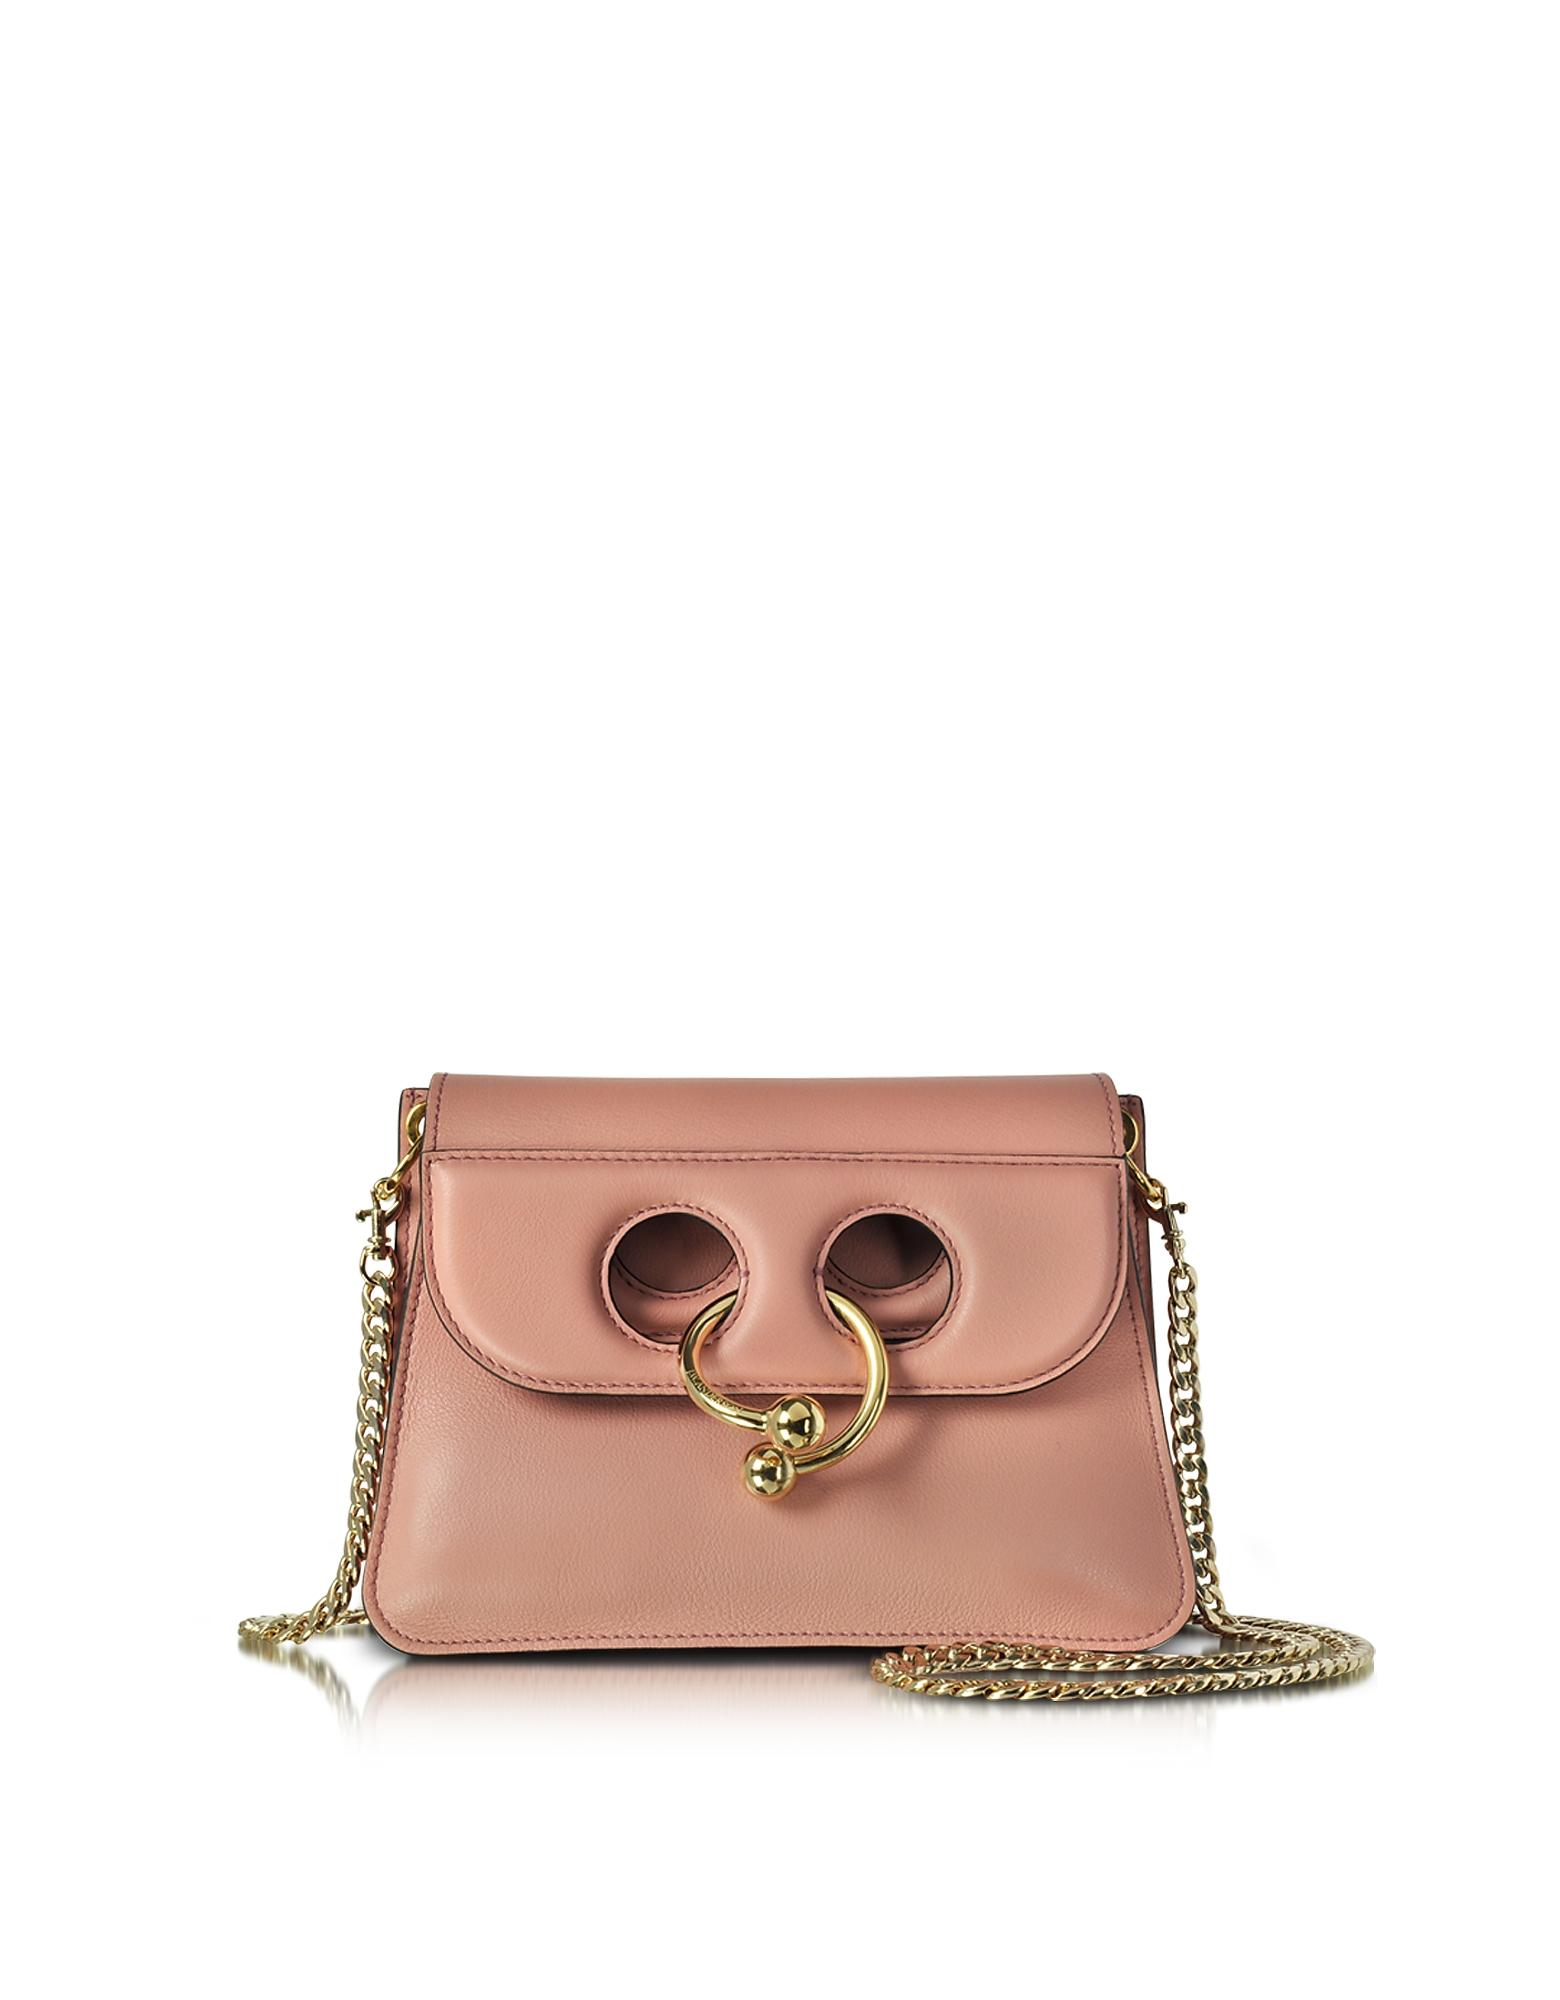 JW Anderson Handbags, Dusty Rose Mini Pierce Bag